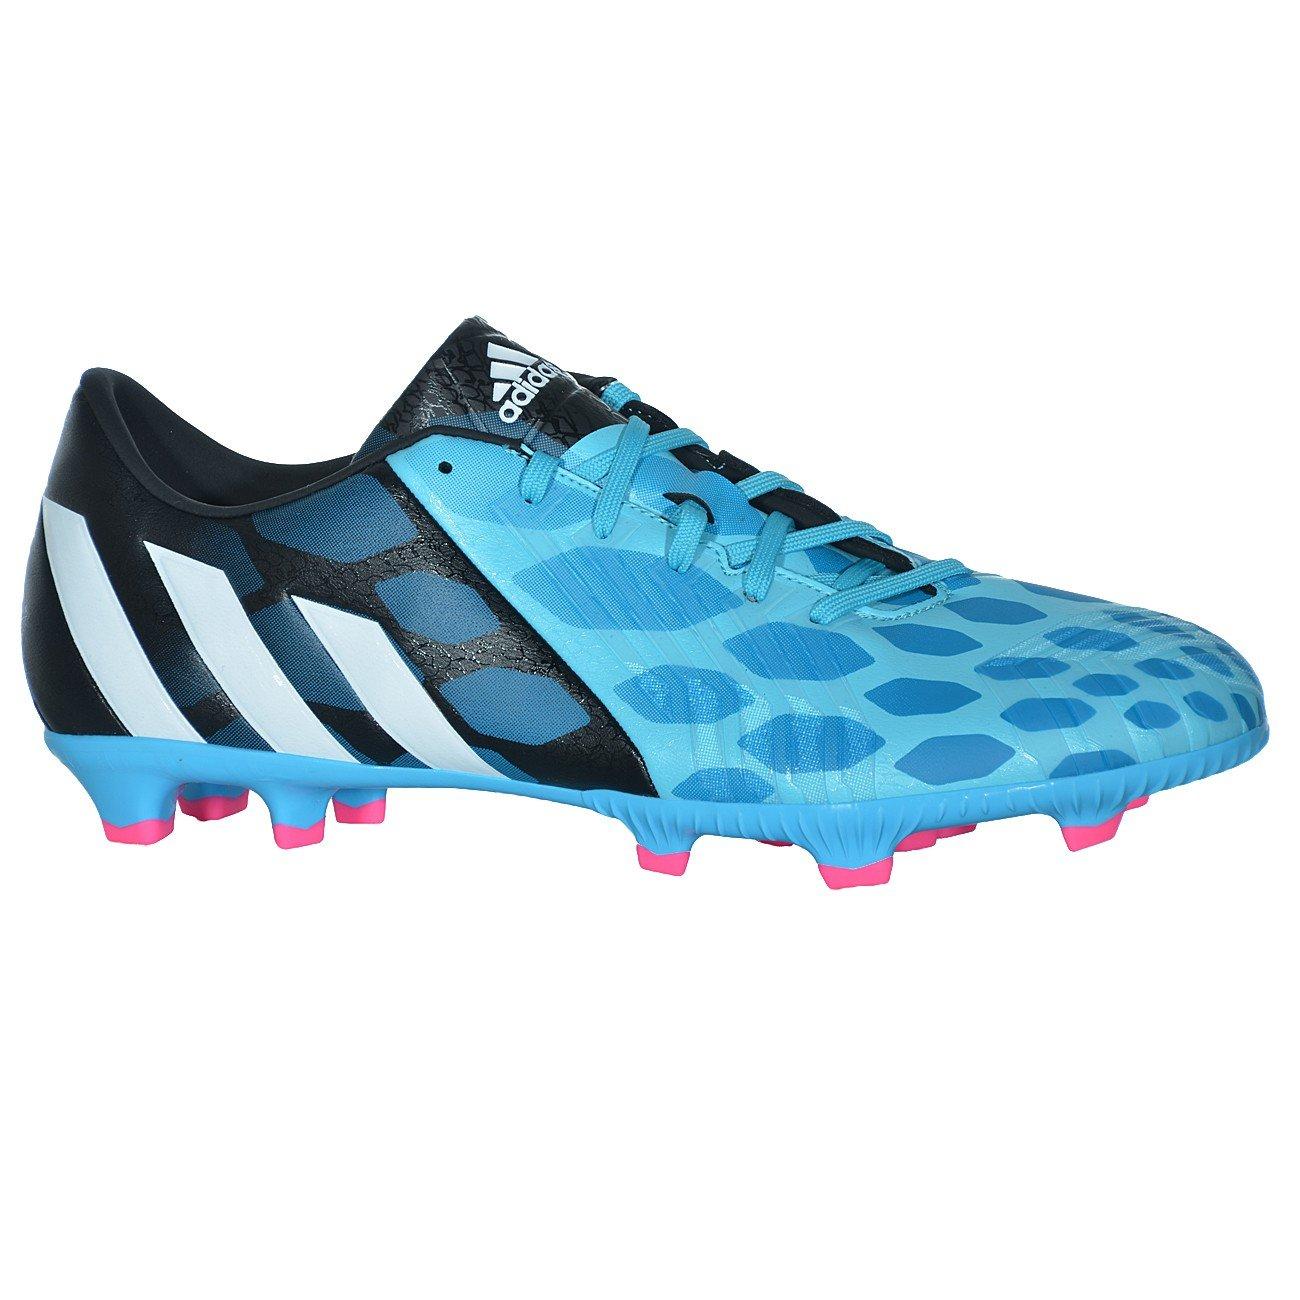 Adidas Absolado Instinct FG Herren Fussballschuhe Schuhe Fußball M17628 Blau